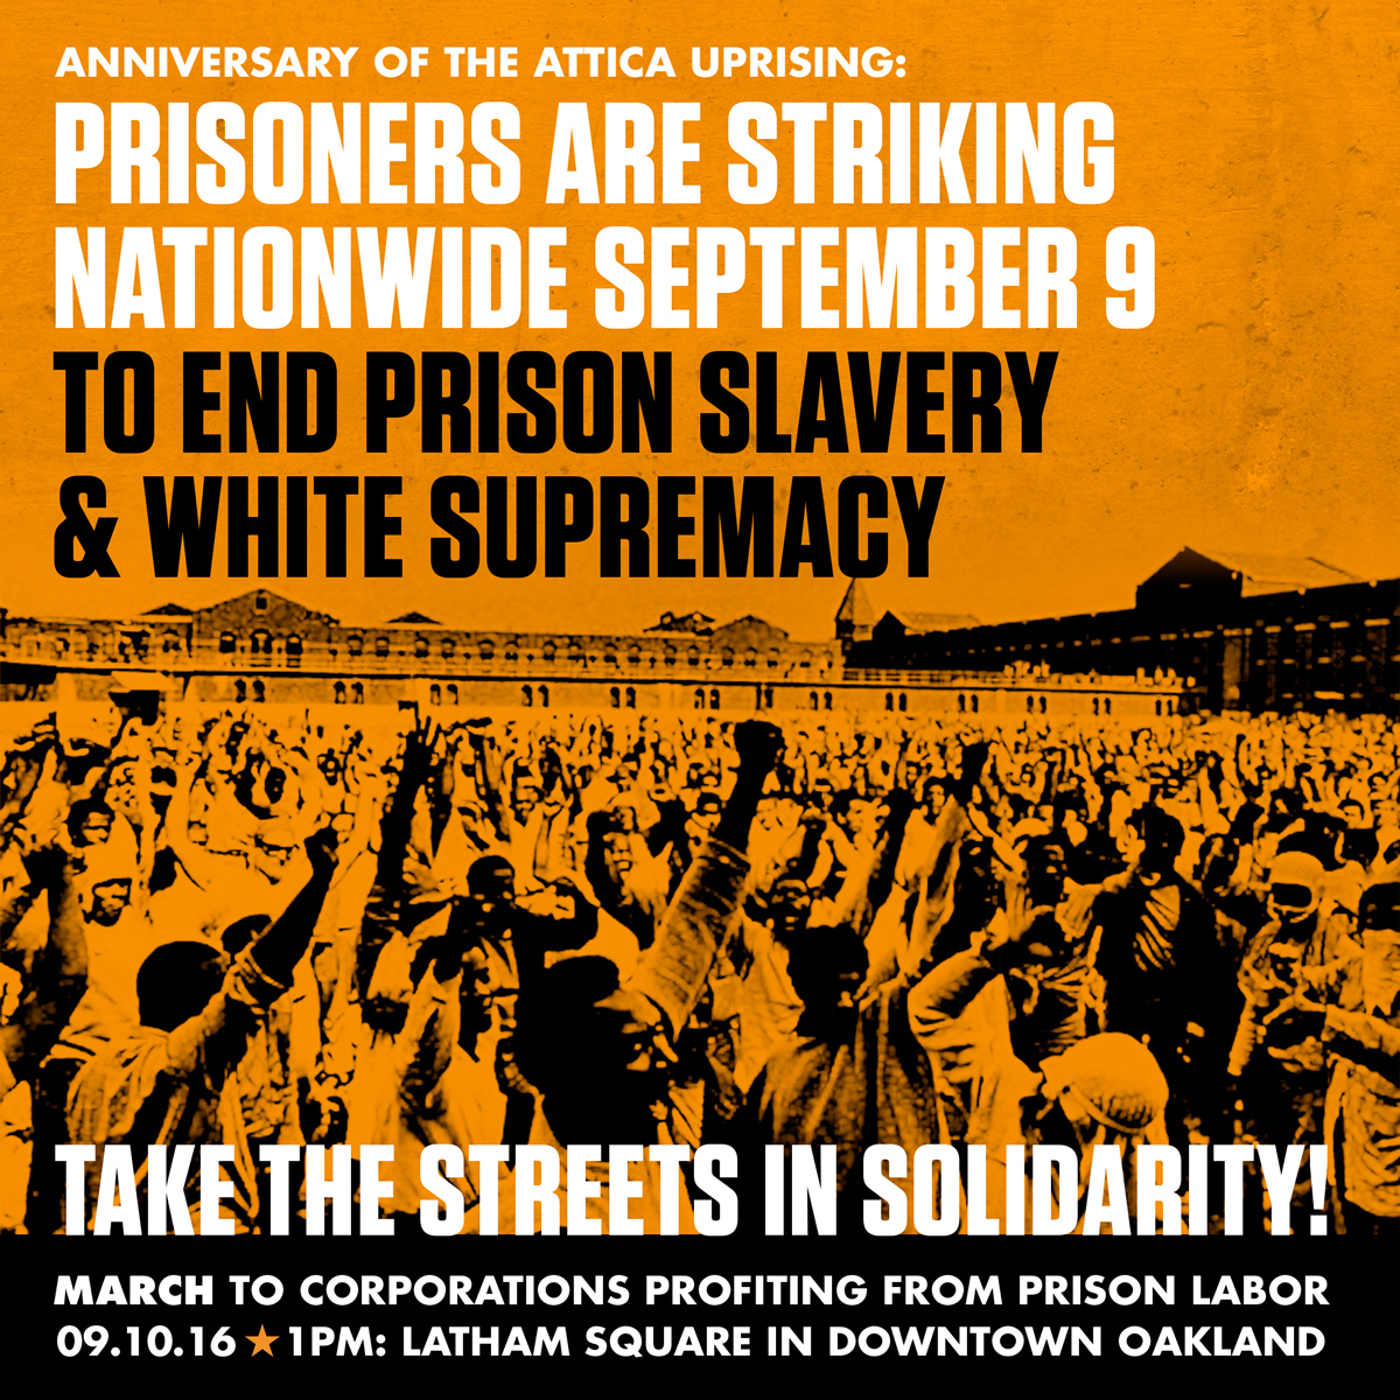 #PrisonStrike